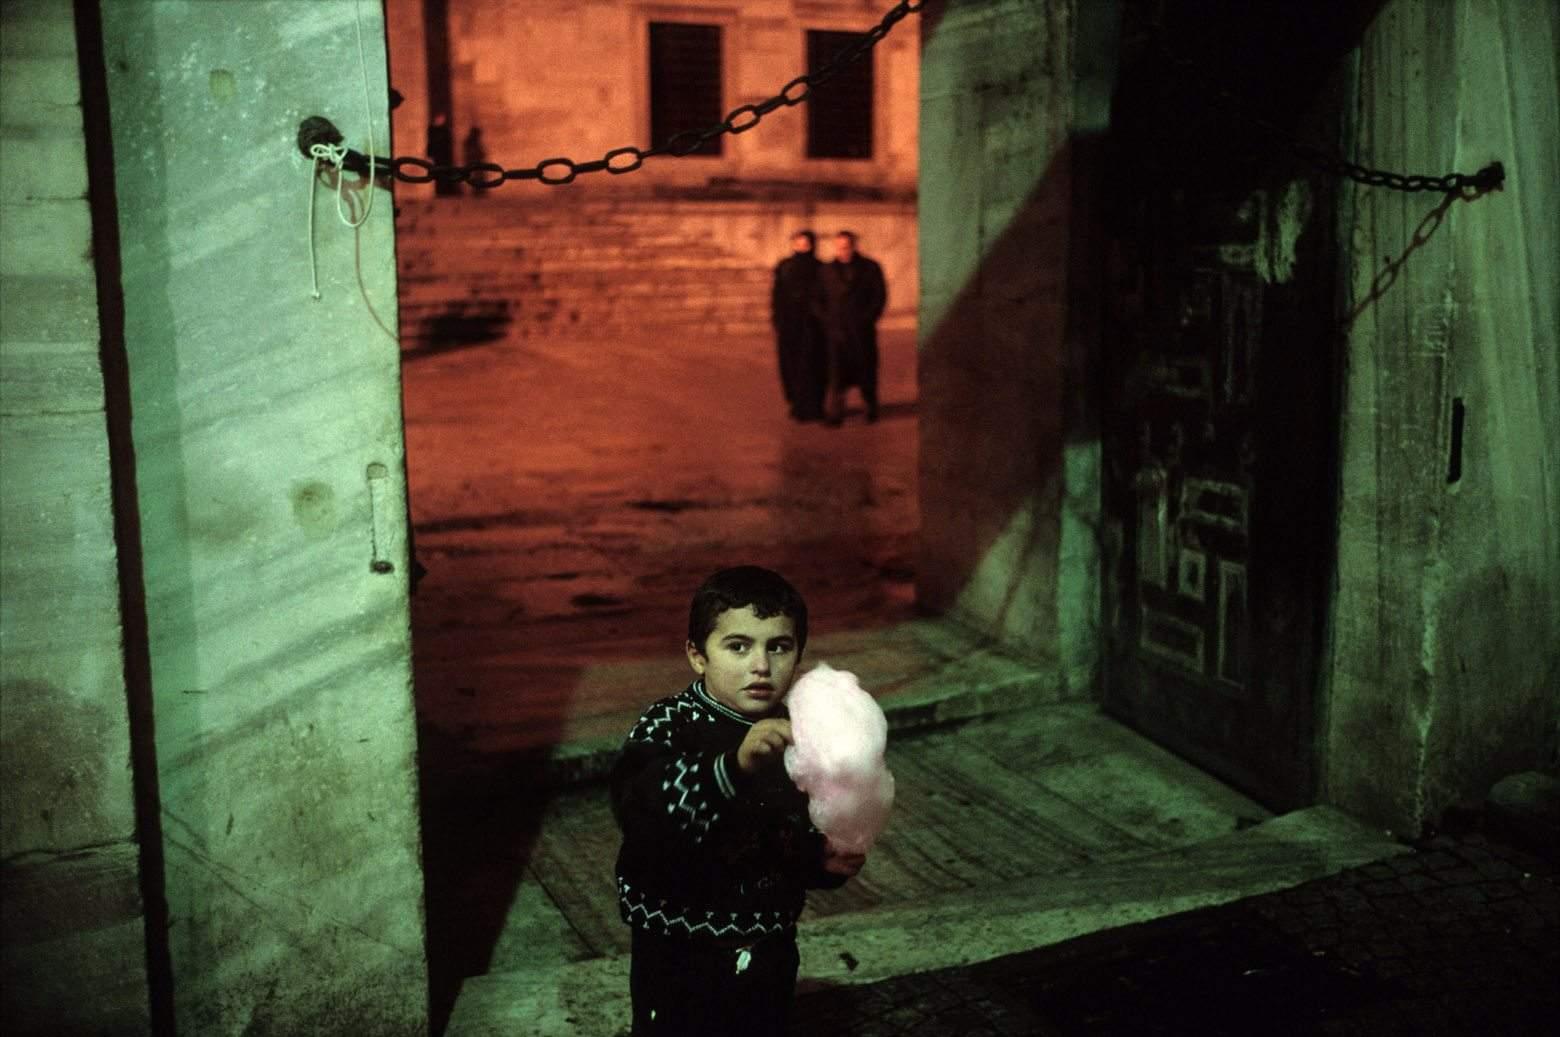 TURKEY. Istanbul. 2001. Outside of the Blue Mosque during Ramadan. (c) Alex Webb / Magnum Photos